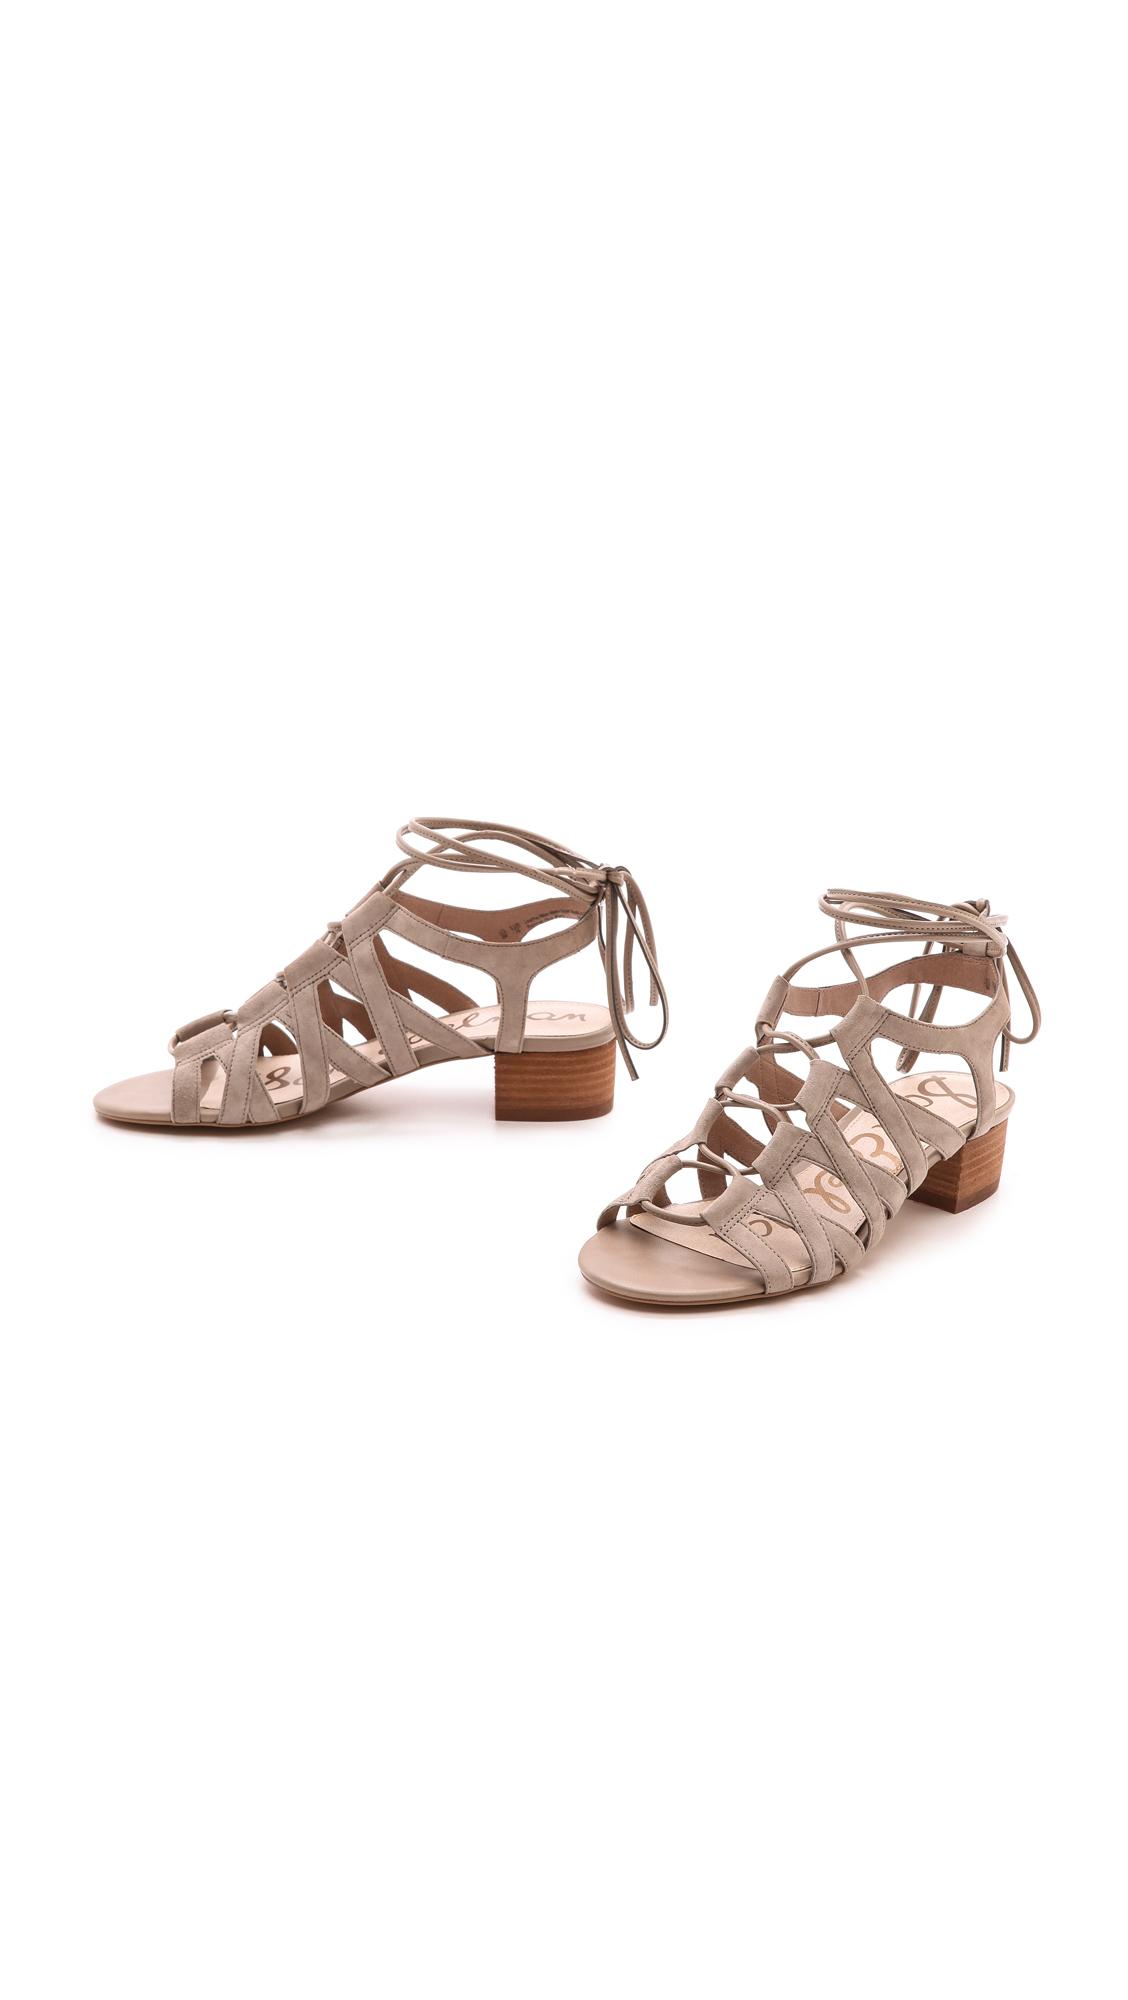 d57bd0fa0235 Sam Edelman Ardella Low Heel Sandals Putty in Natural - Lyst